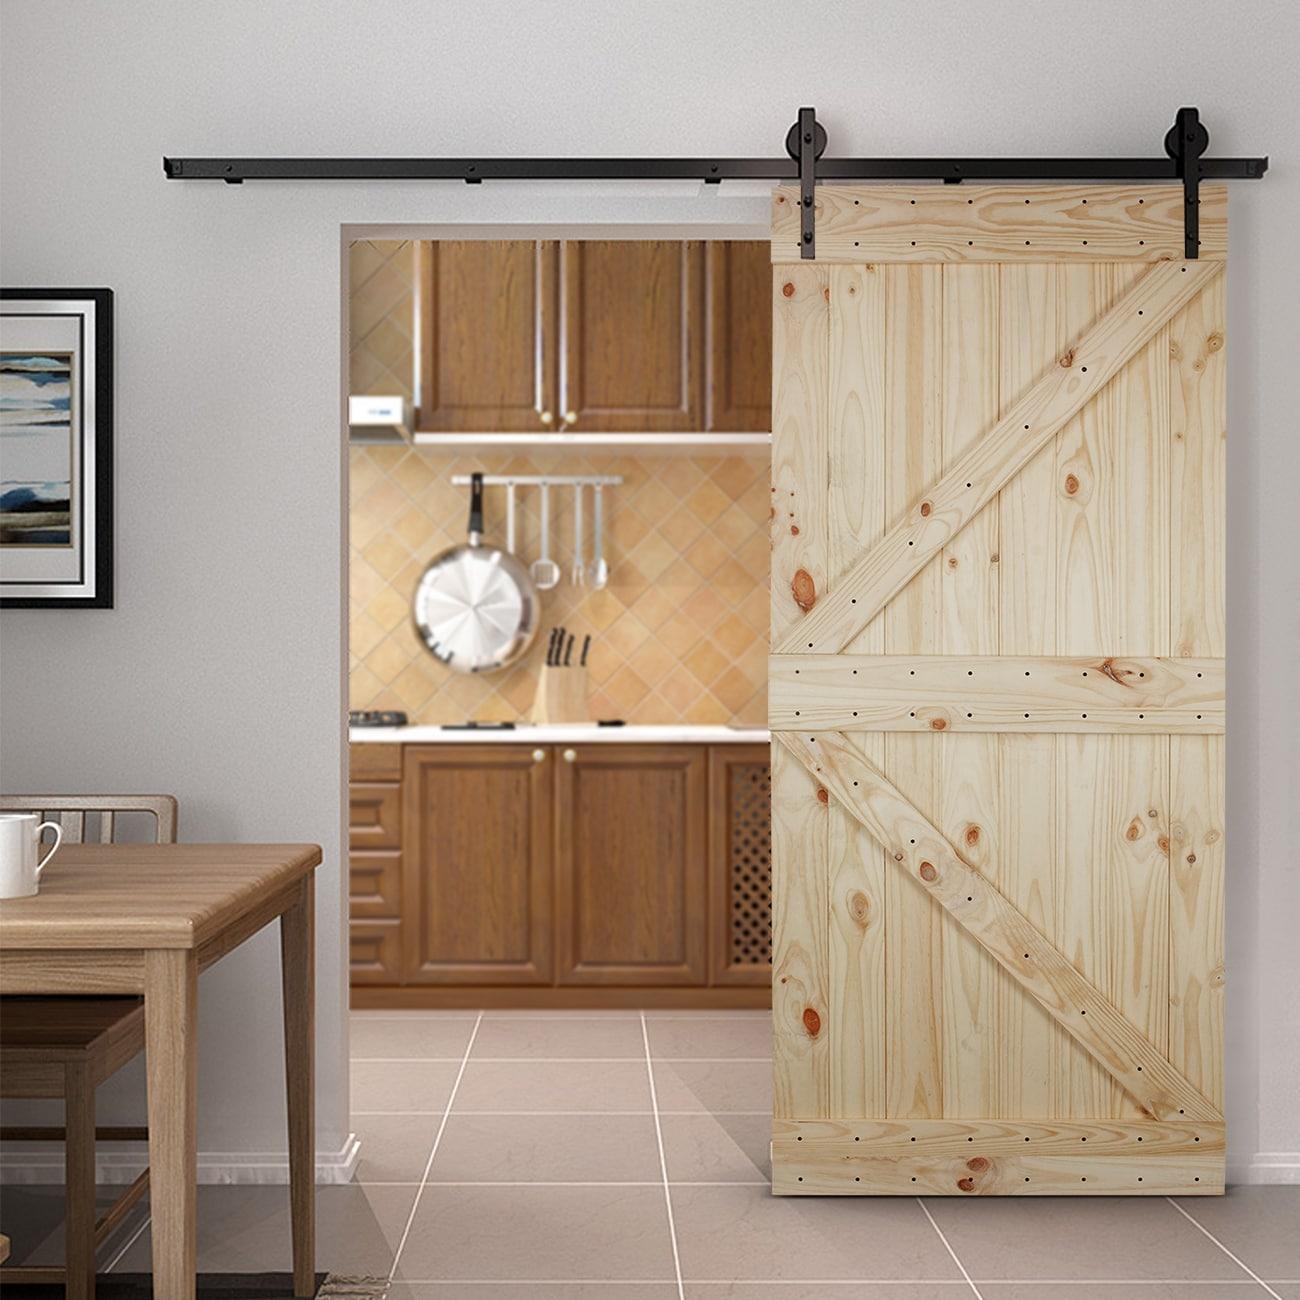 Belleze 36 X 84 Inches Diy Sliding Barn Door Natural Wood Pine Unfinished Left Arrow